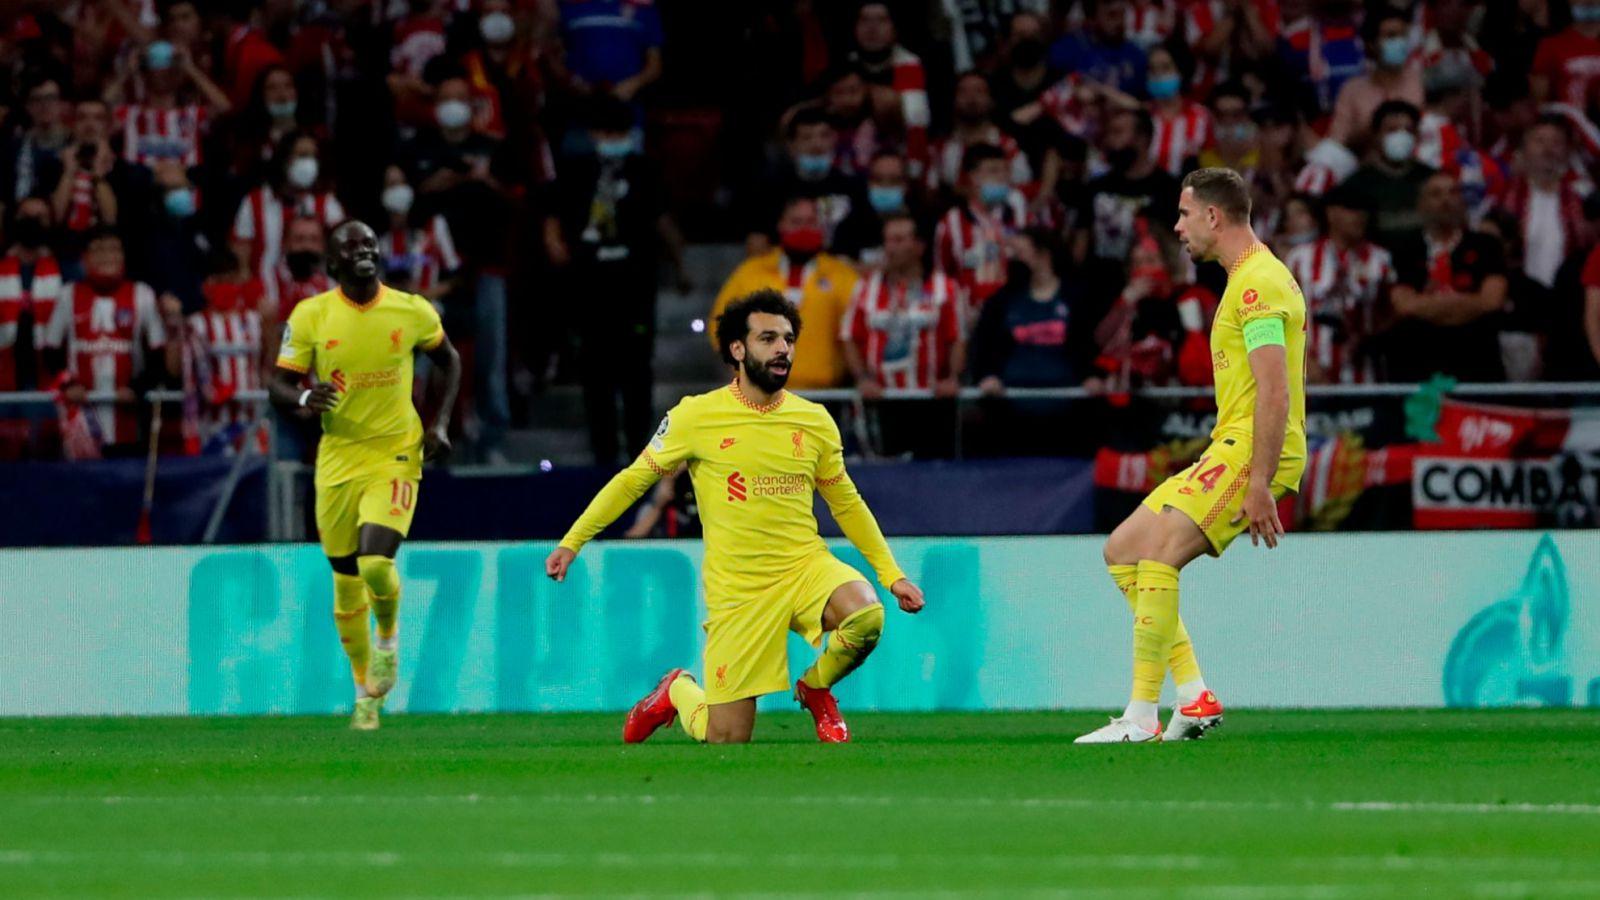 Atletico Madrid 2-3 Liverpool 2021.10.19 (20h00) Full Goals Highlight